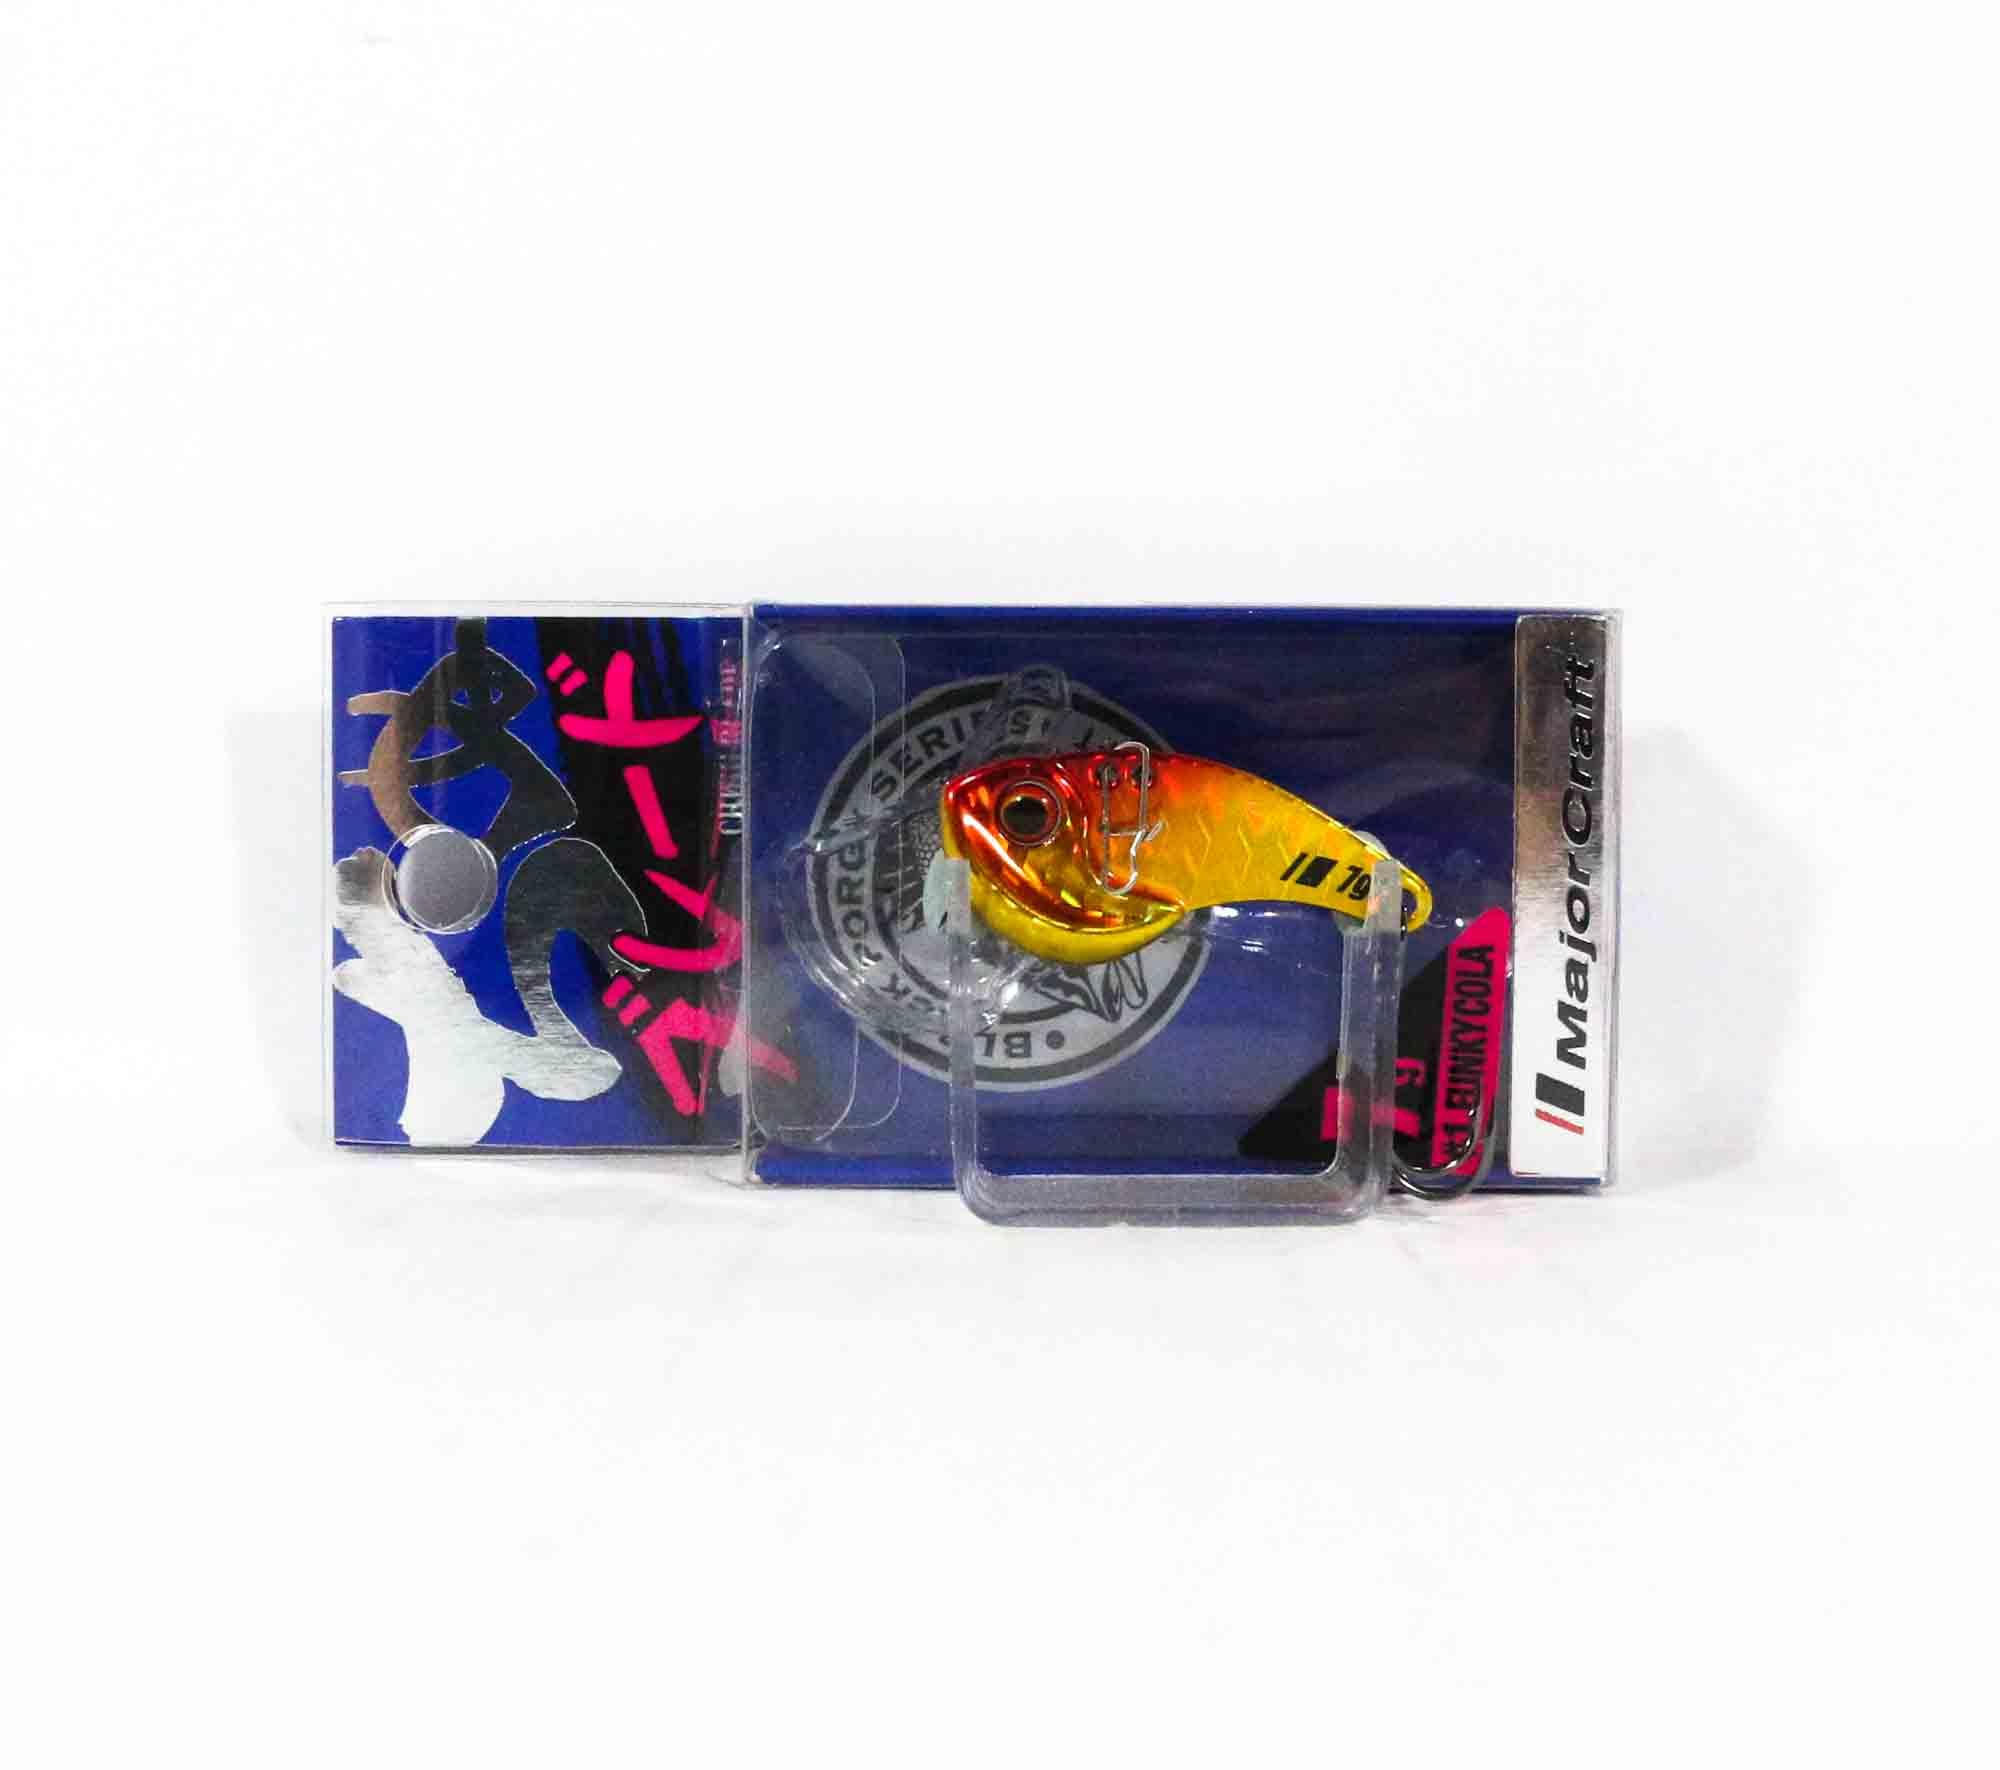 Major Craft Chinu Blade BKP-BLADE 7 grams 001 (8076)